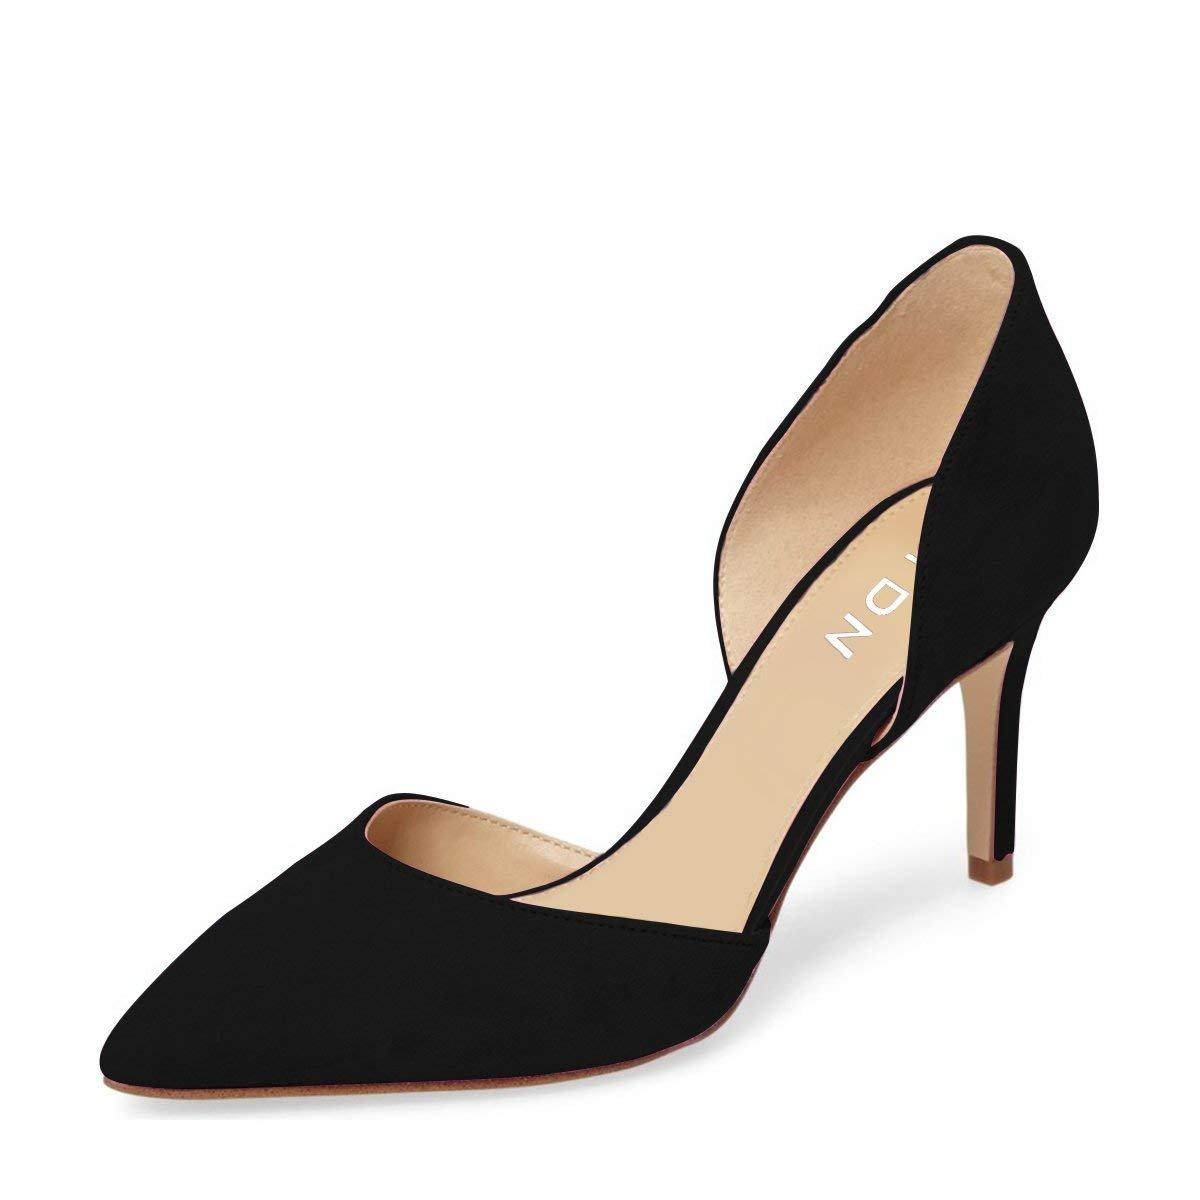 YDN Women Classic Low Heels D'Orsay Pumps Suede Pointed Toe Slip On Dressy Stilettos Shoes B01N0QCM82 13 B(M) US|Black